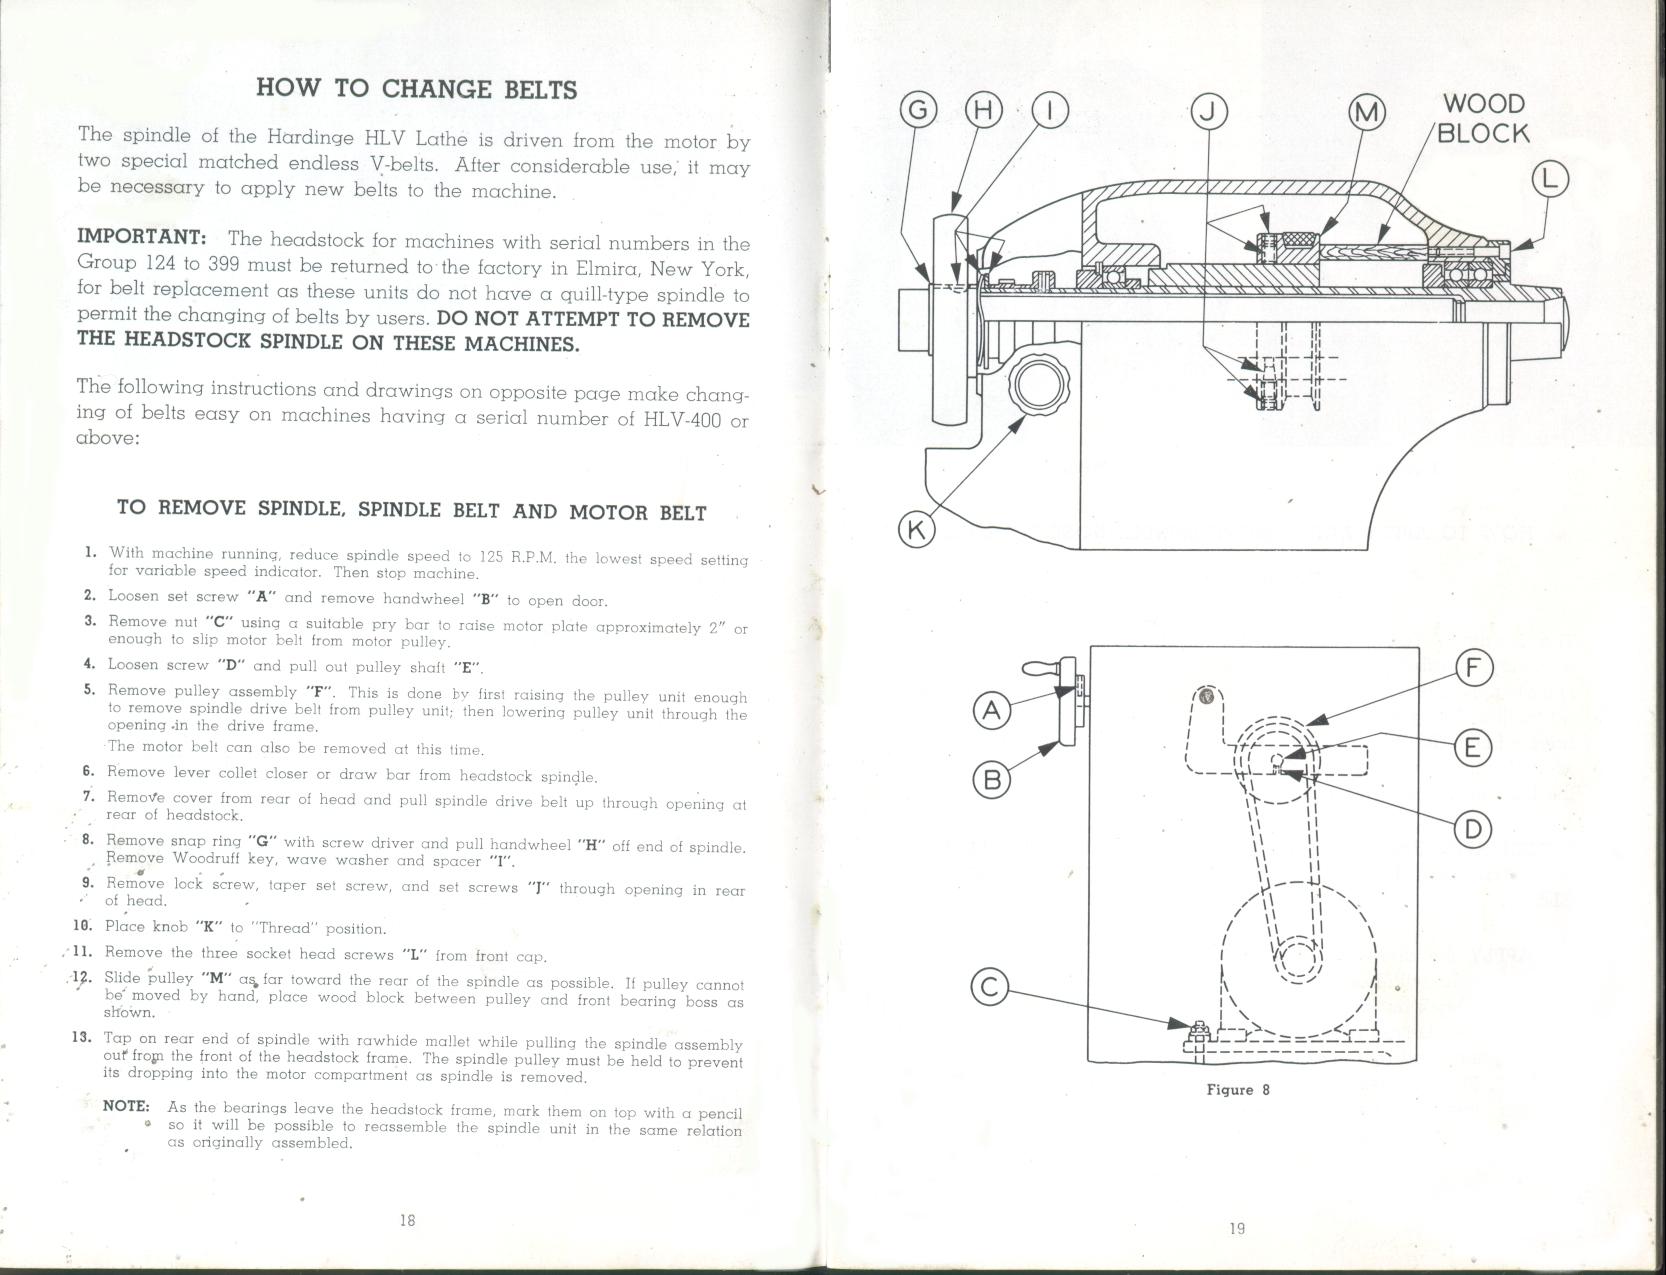 Hardinge HLV User's Manual on